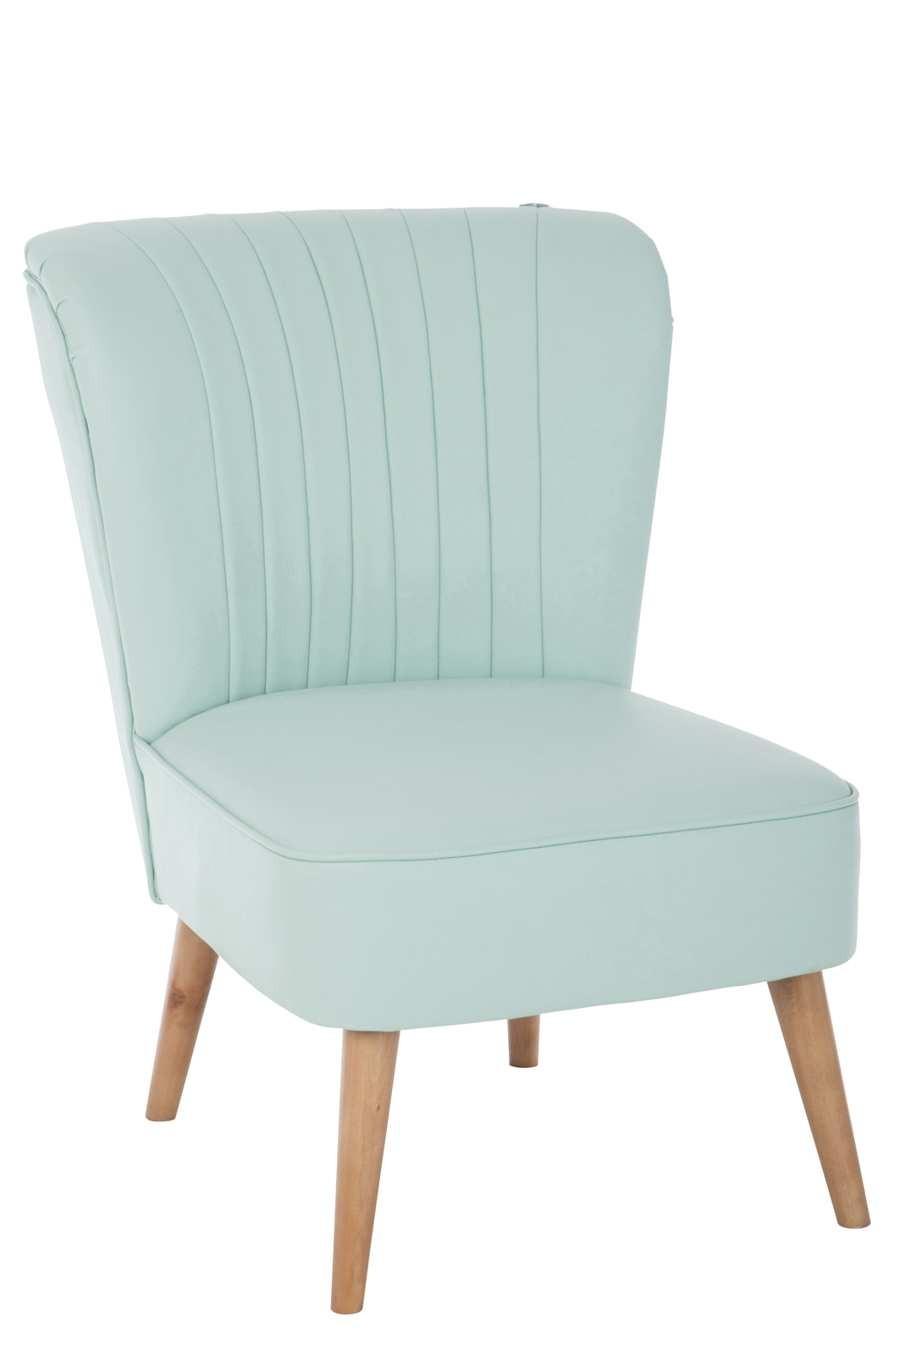 chambre scandinave vert. Black Bedroom Furniture Sets. Home Design Ideas